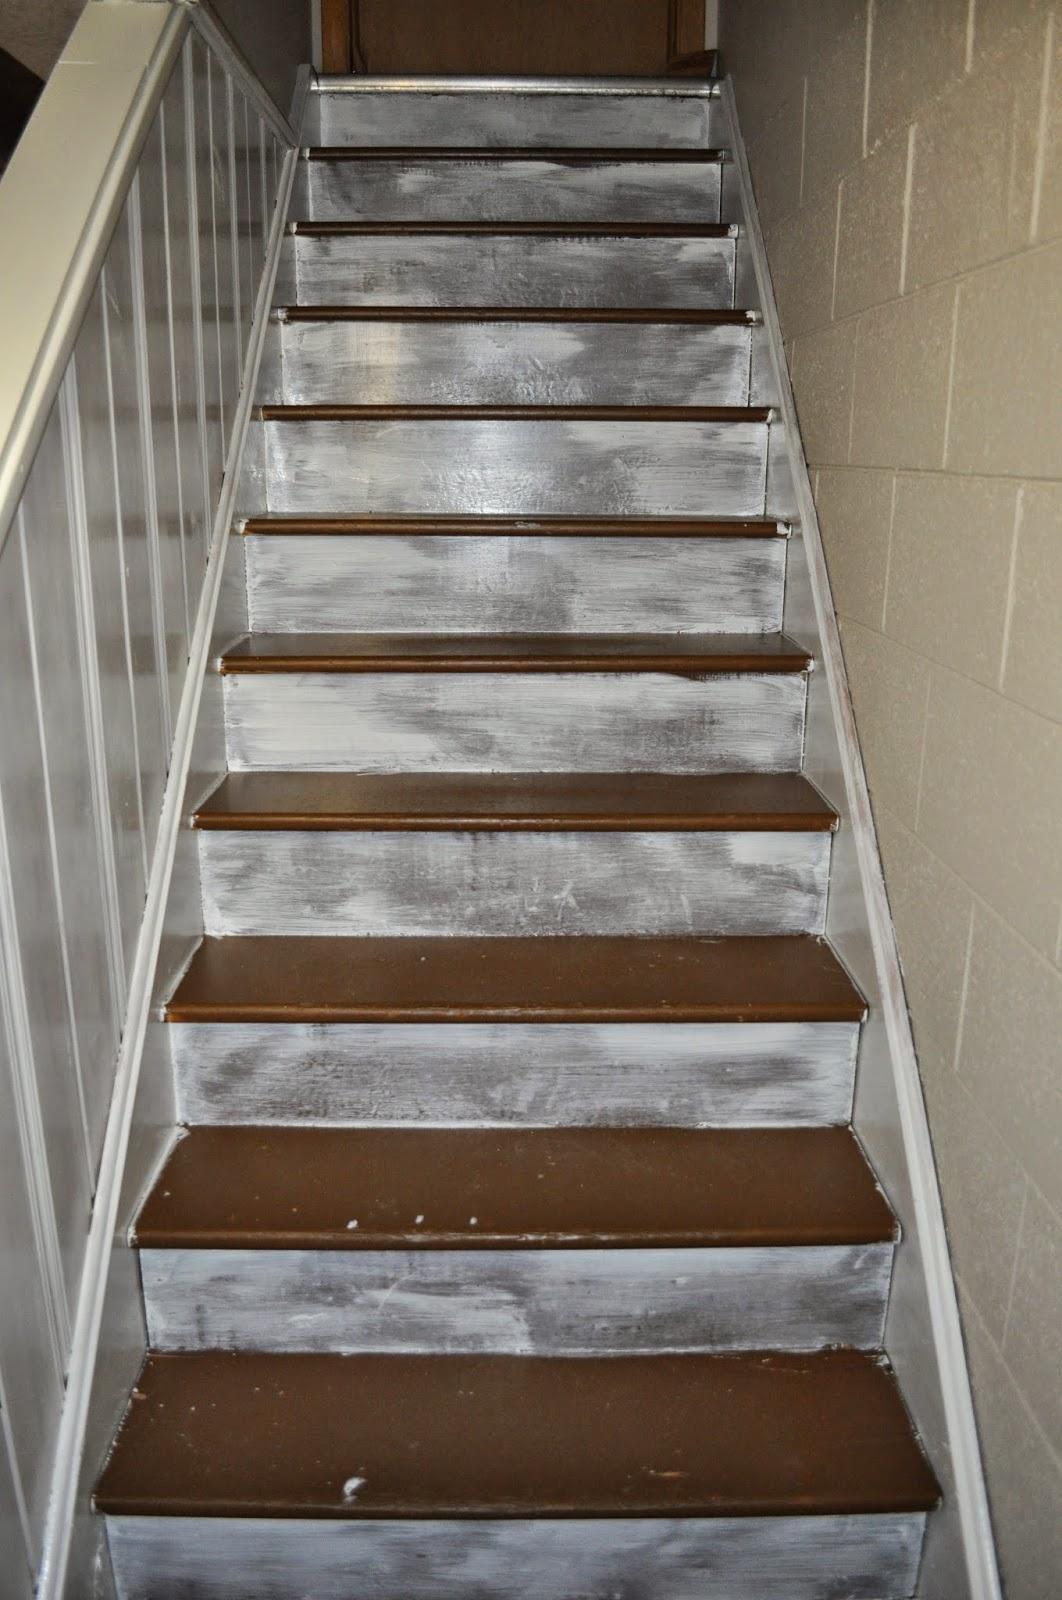 stairs, painting, basement, basement stairs, treads, risers, runner, lighting, paint